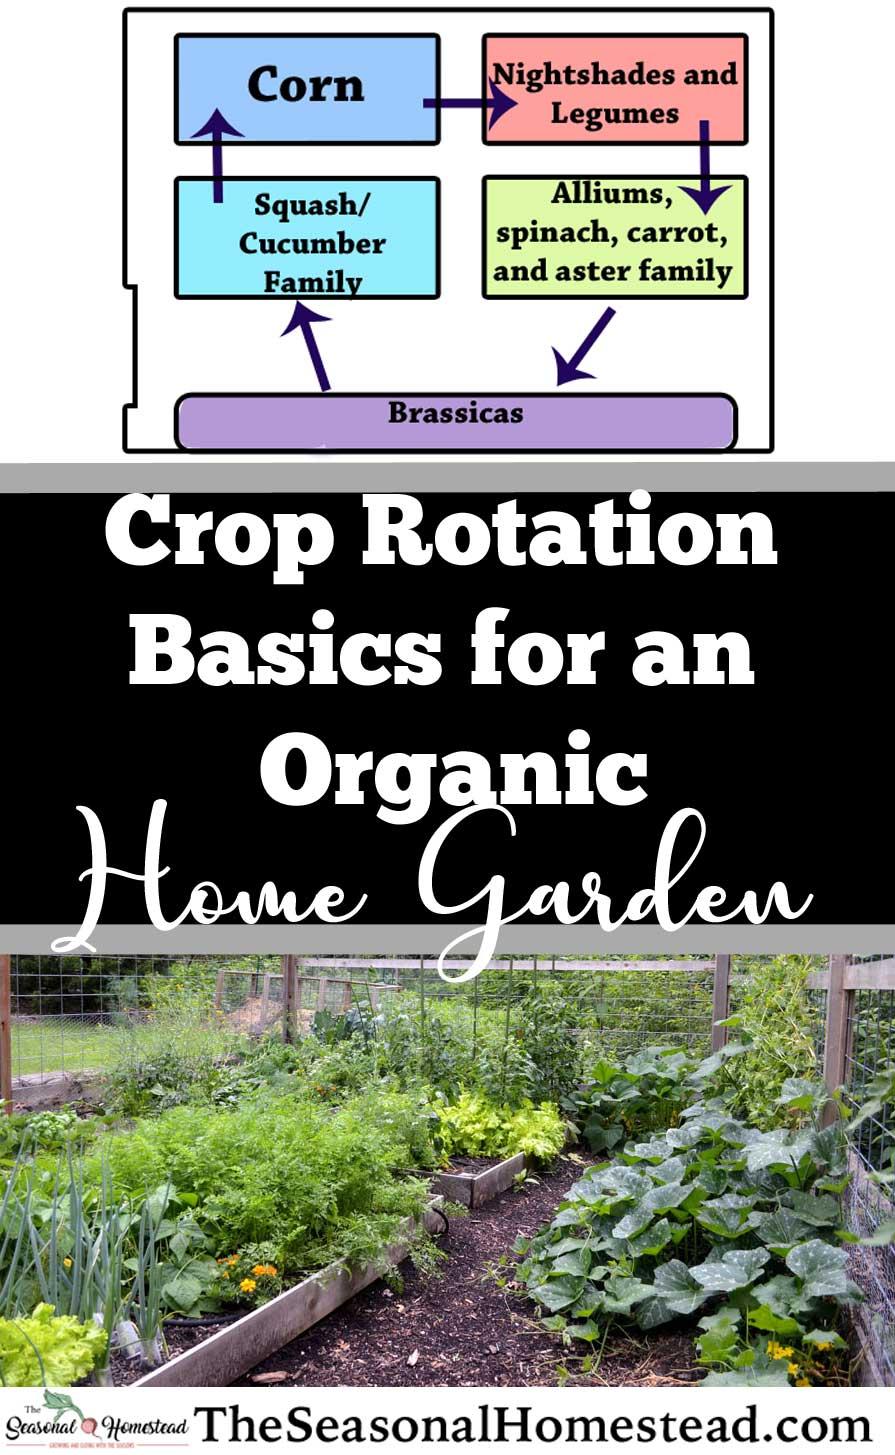 Crop-Rotation-Basics-for-an-Organic-Home-Garden.jpg